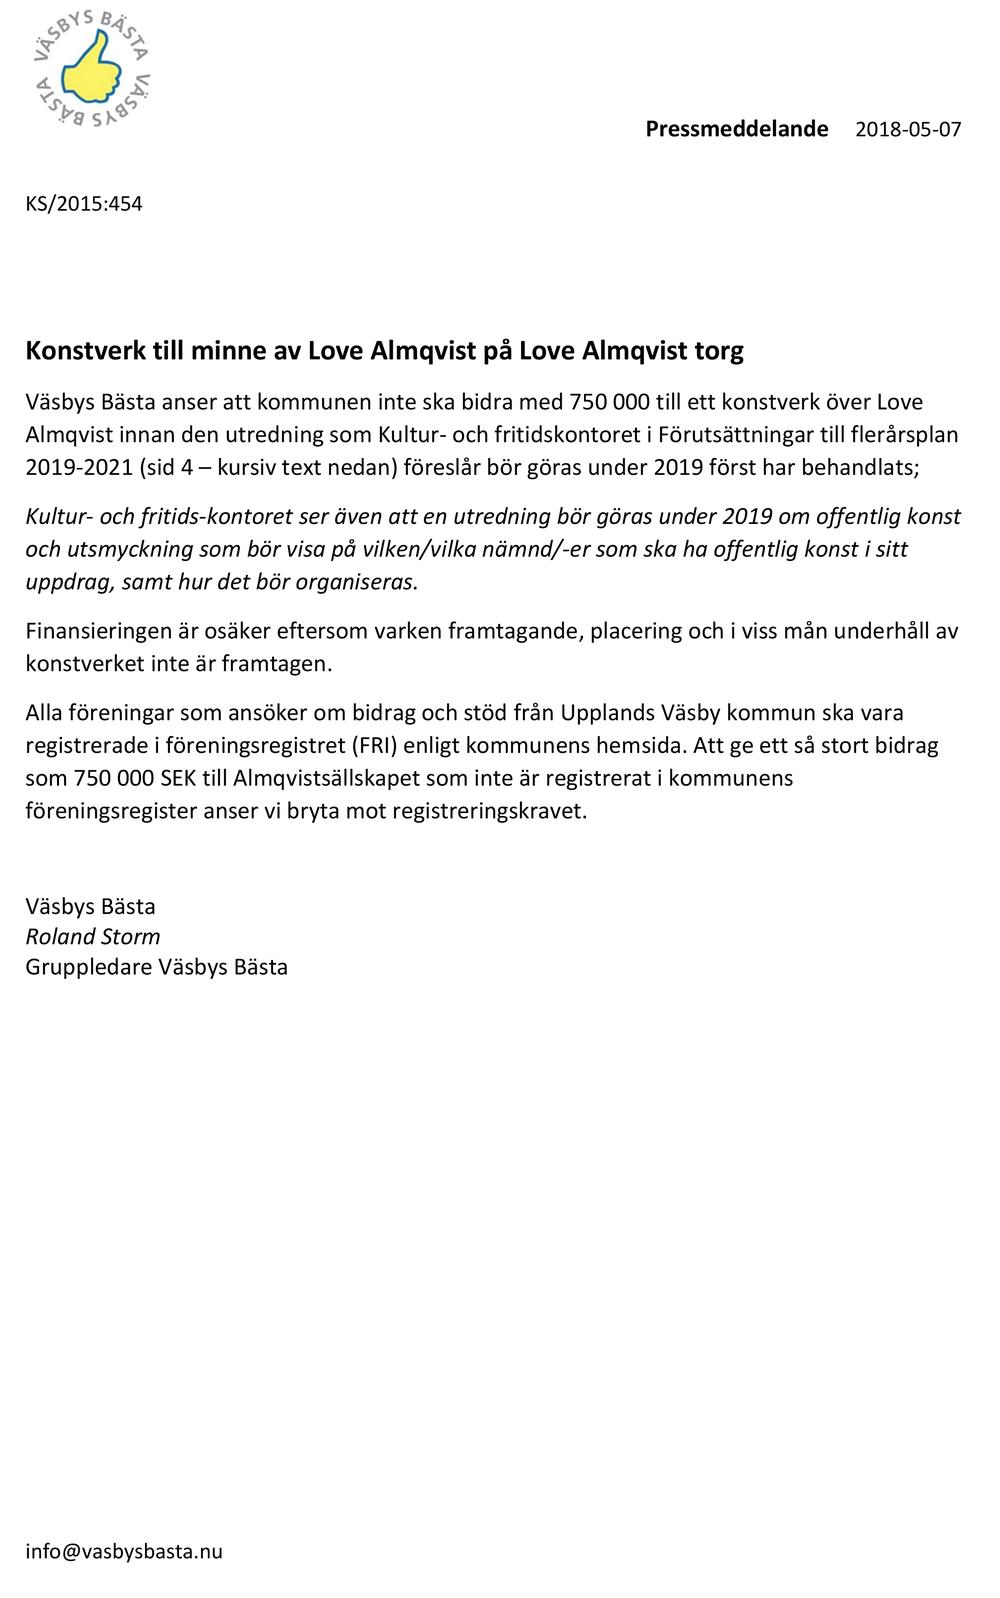 2018-05-07 Pressmeddelande Konstverk Love Almqvist kopiera.png